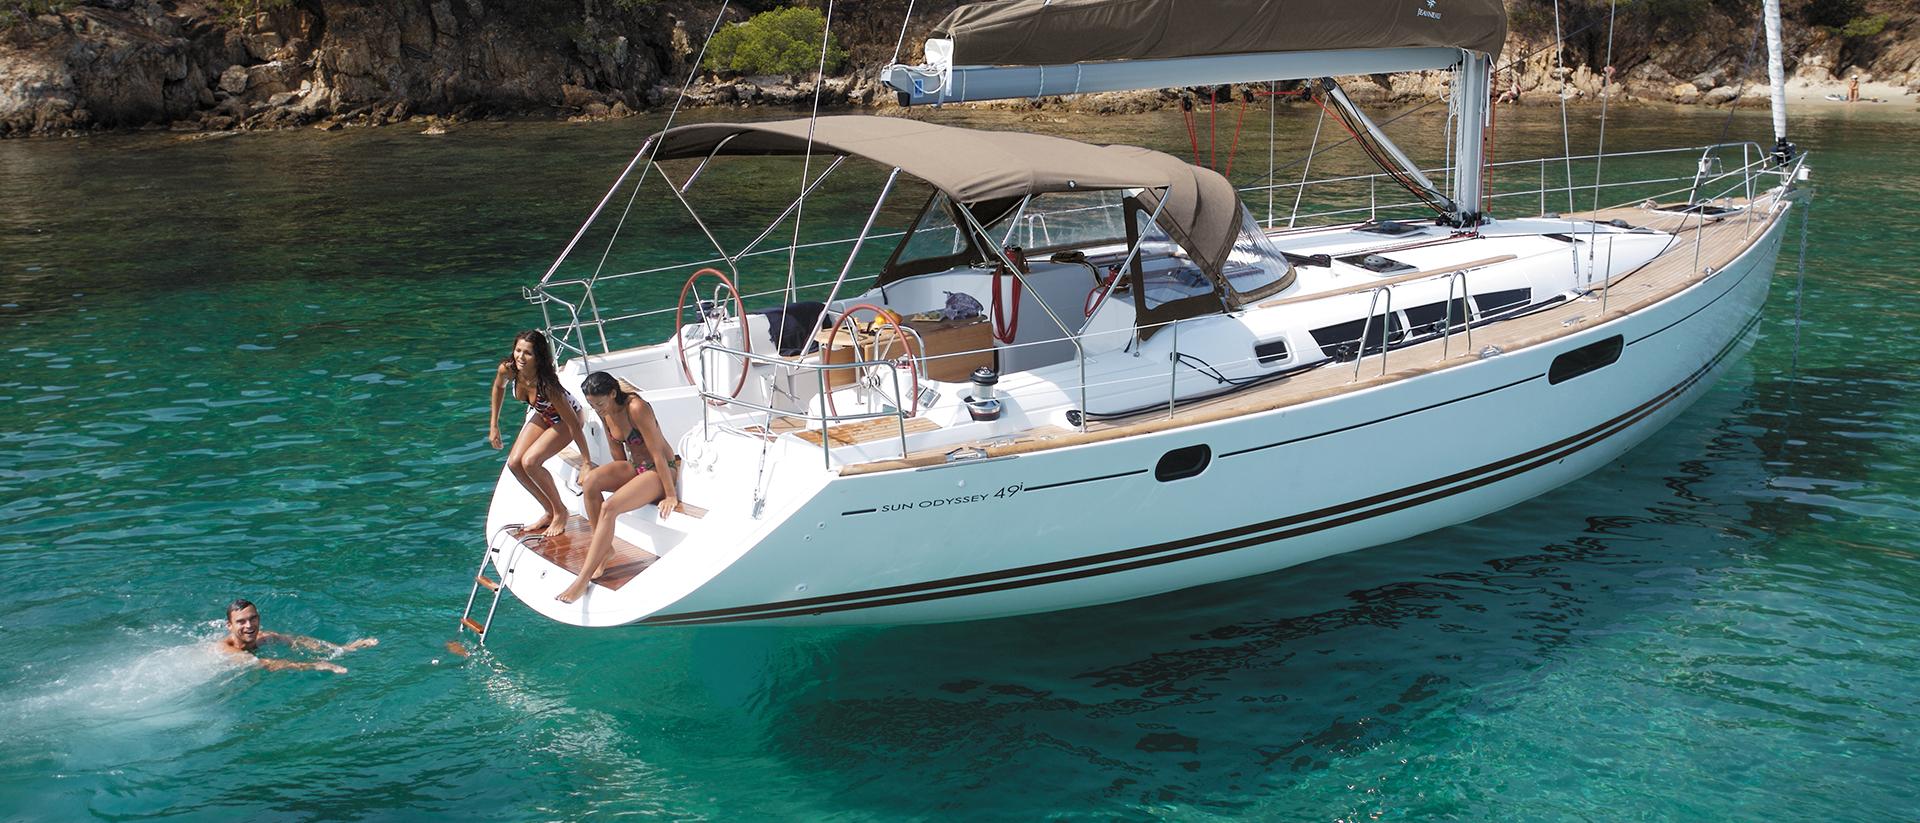 Bareboat Yacht Charter, Bareboat Sailing Boat Charter